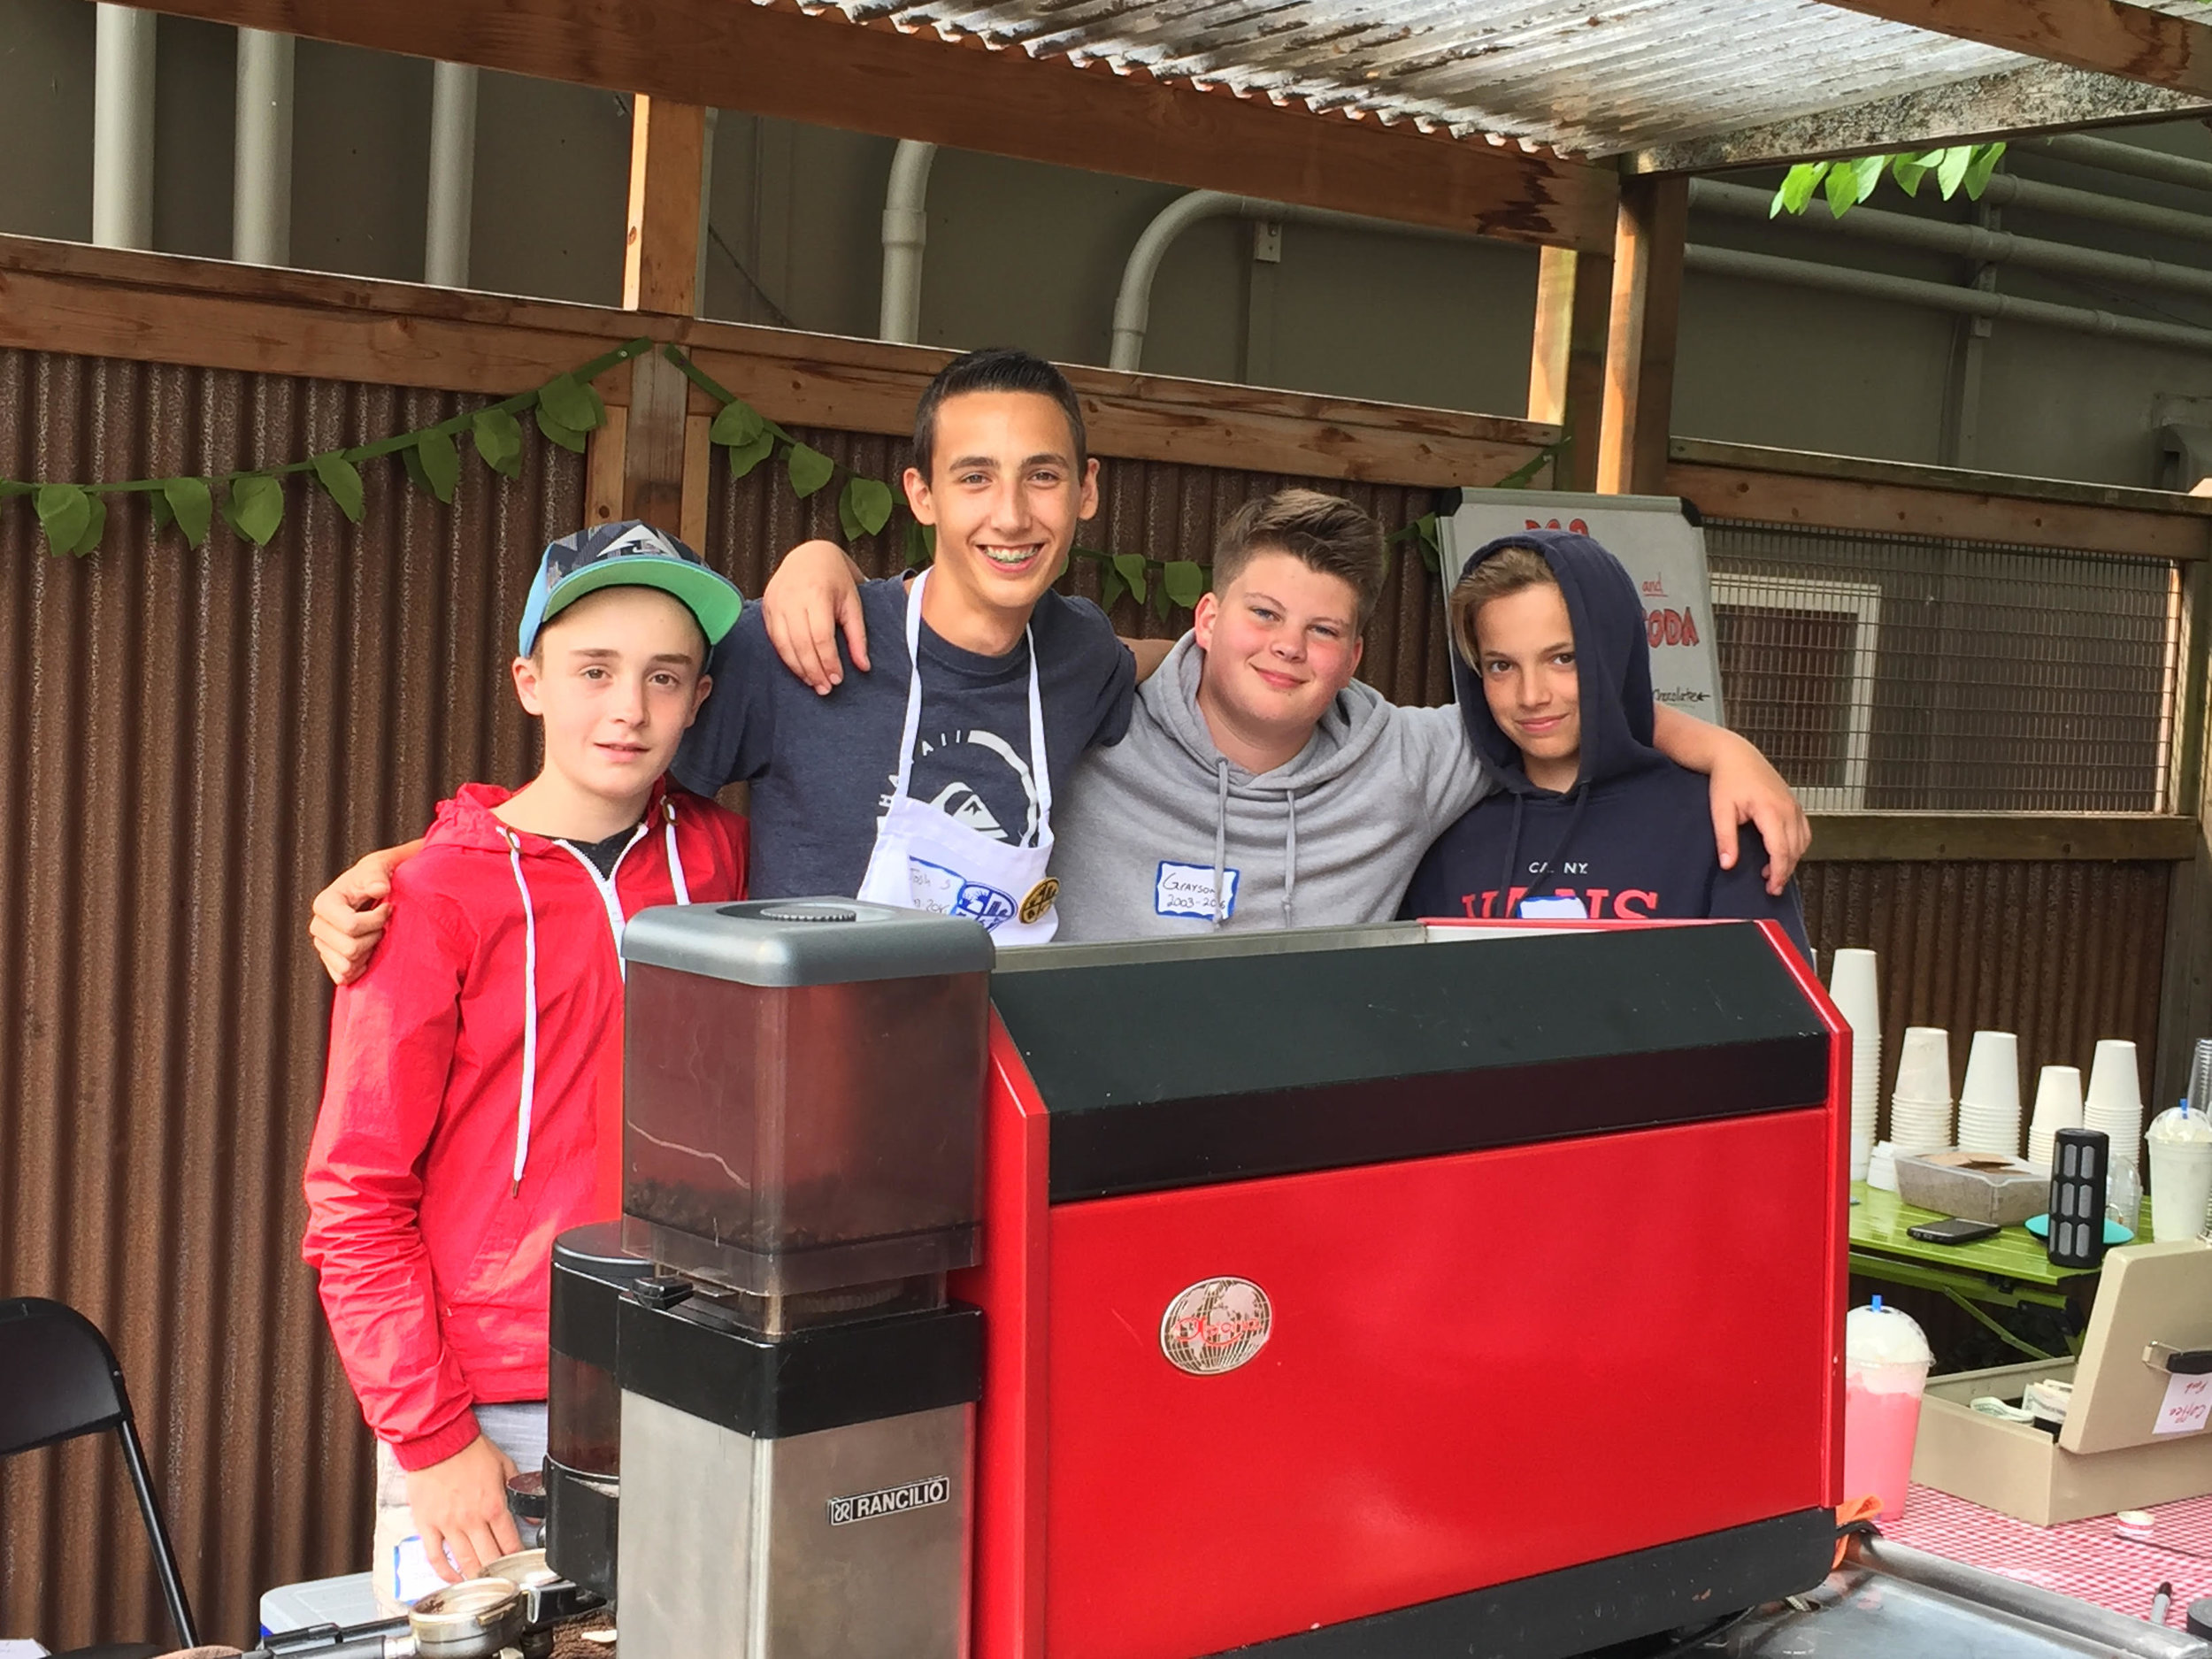 espresso cart crew).jpg